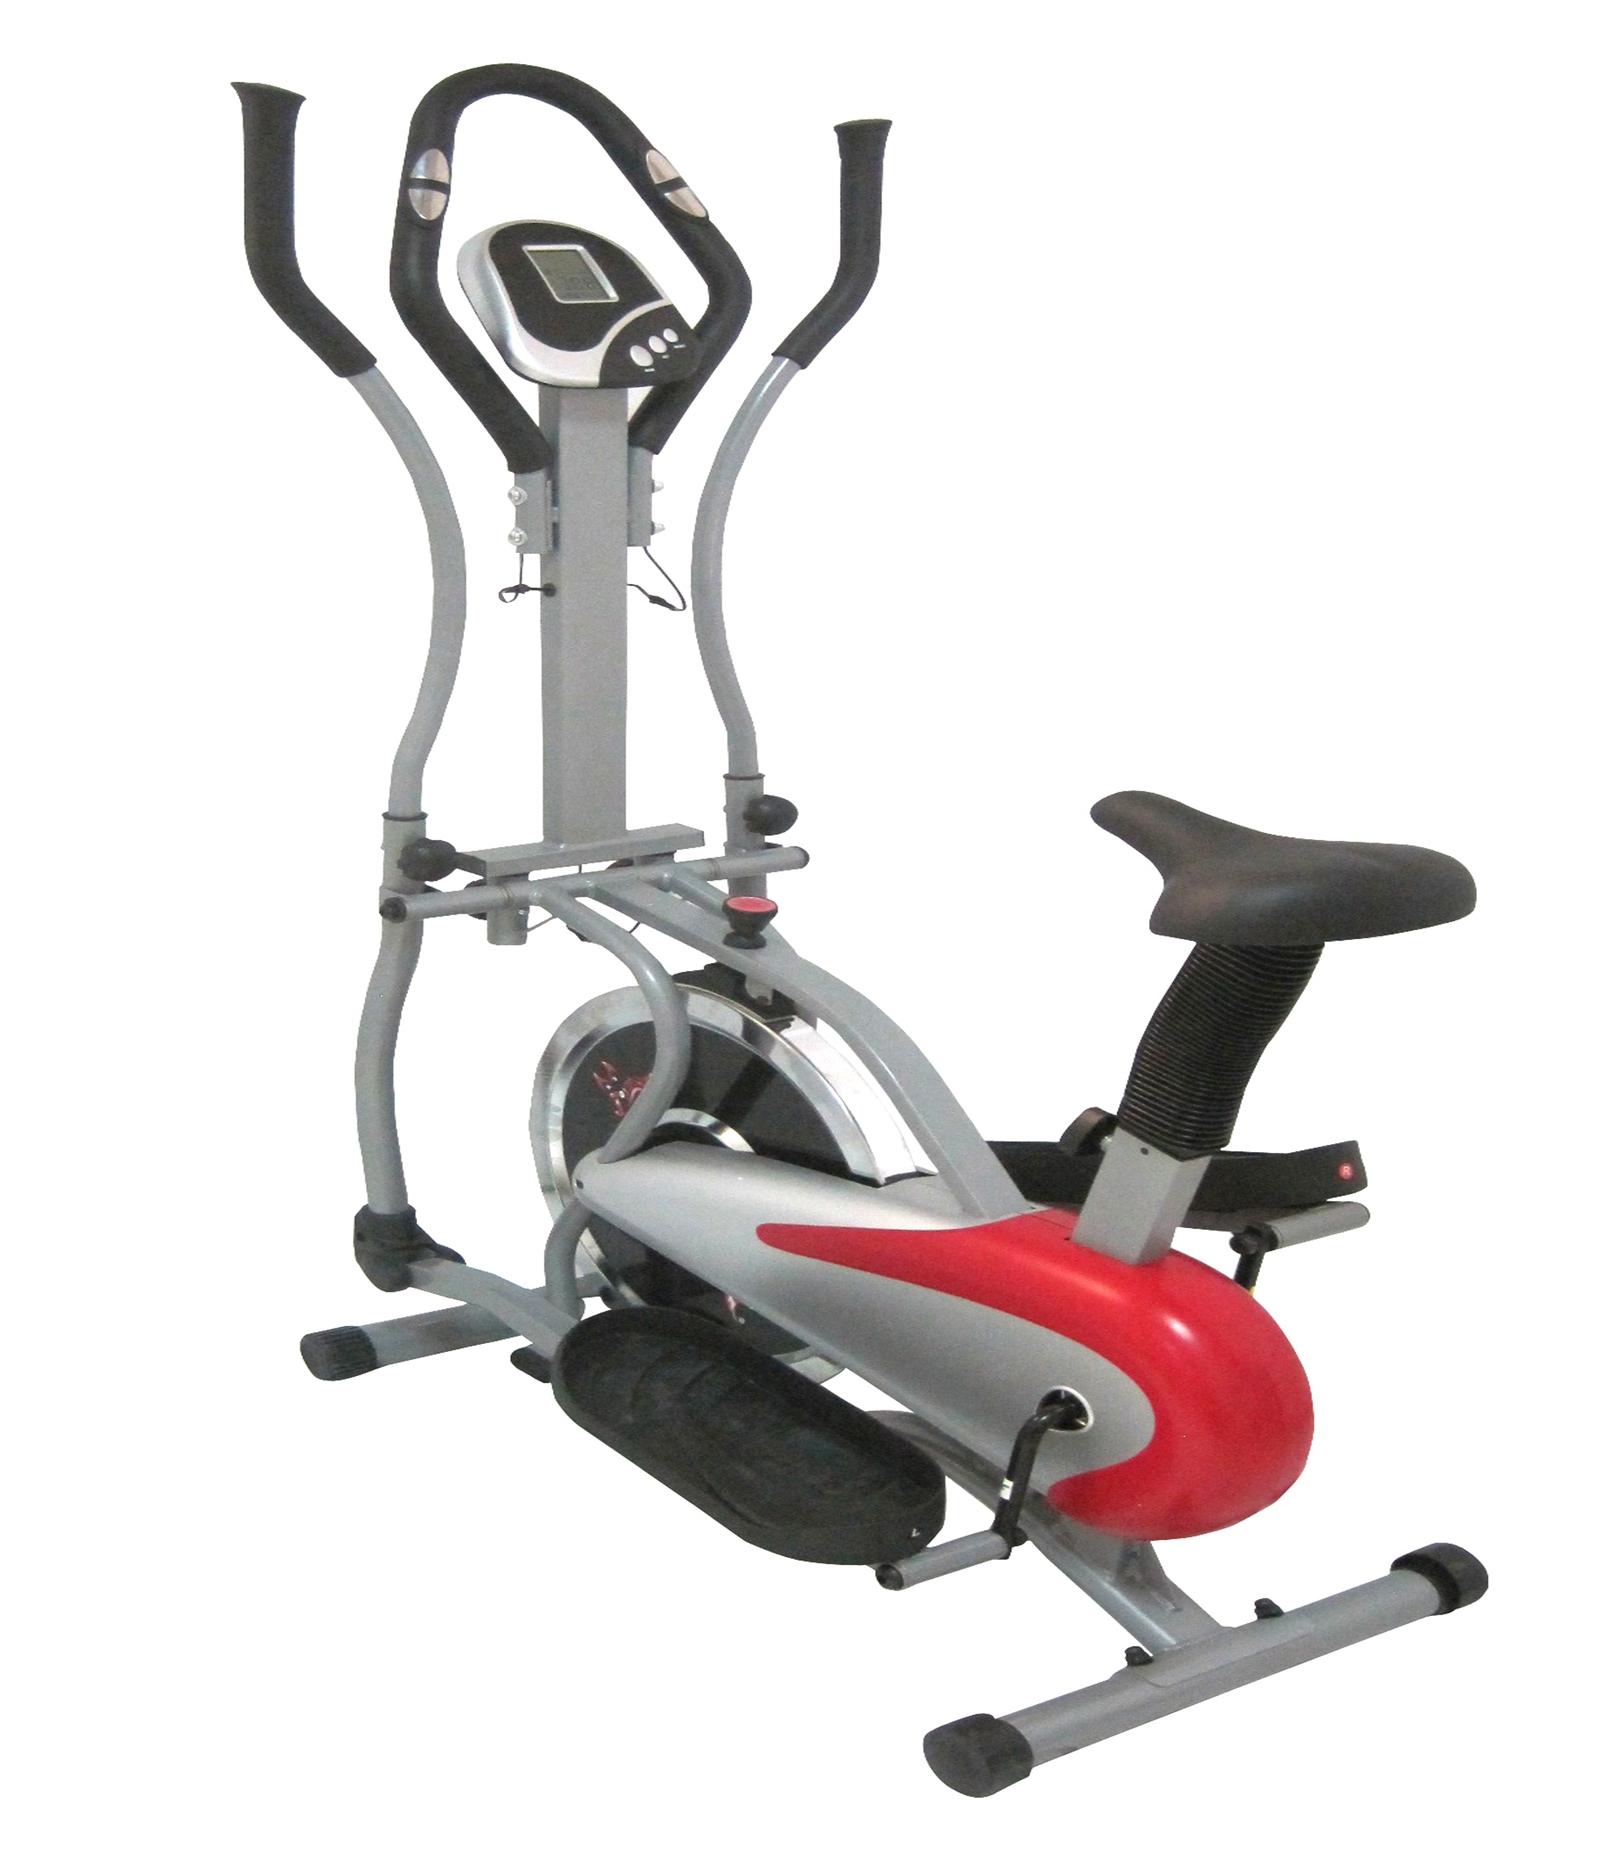 Foxhunter elliptique cross trainer v lo fitness cardio workout gym rouge - Velo elliptique cardio training ...